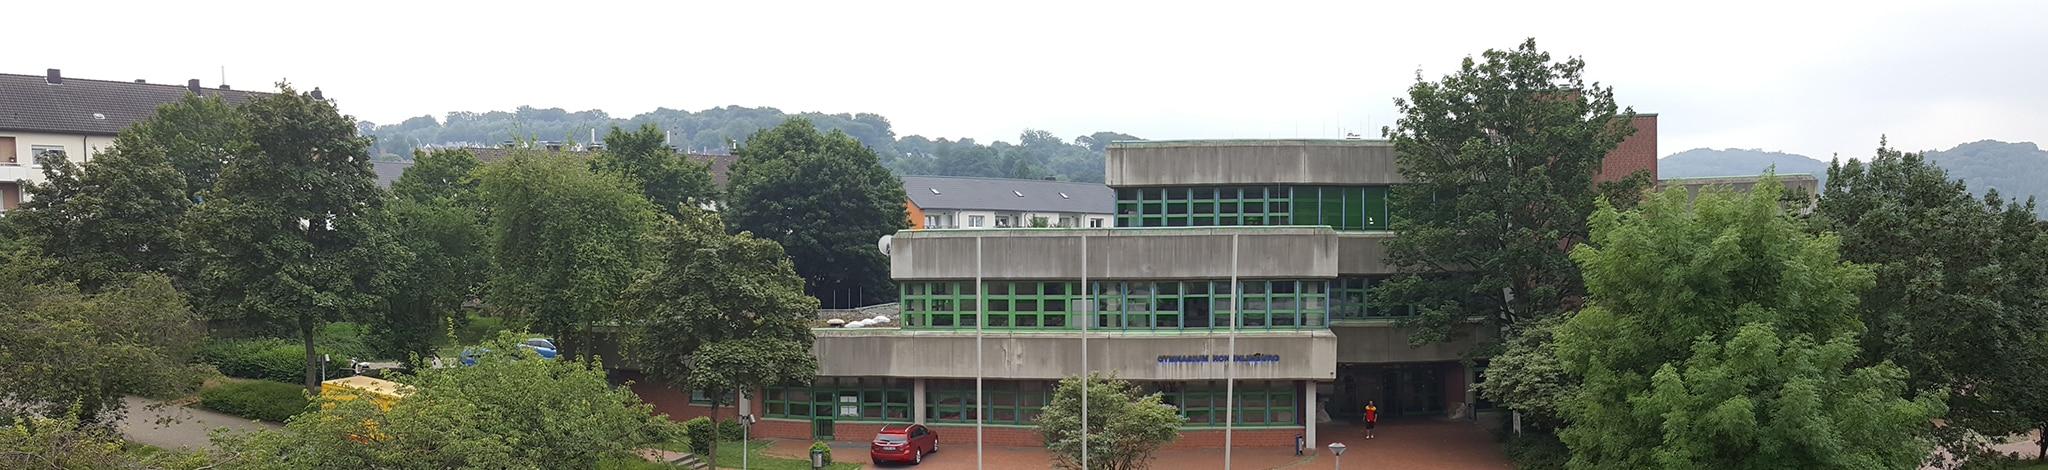 Gymnasium Hohenlimburg